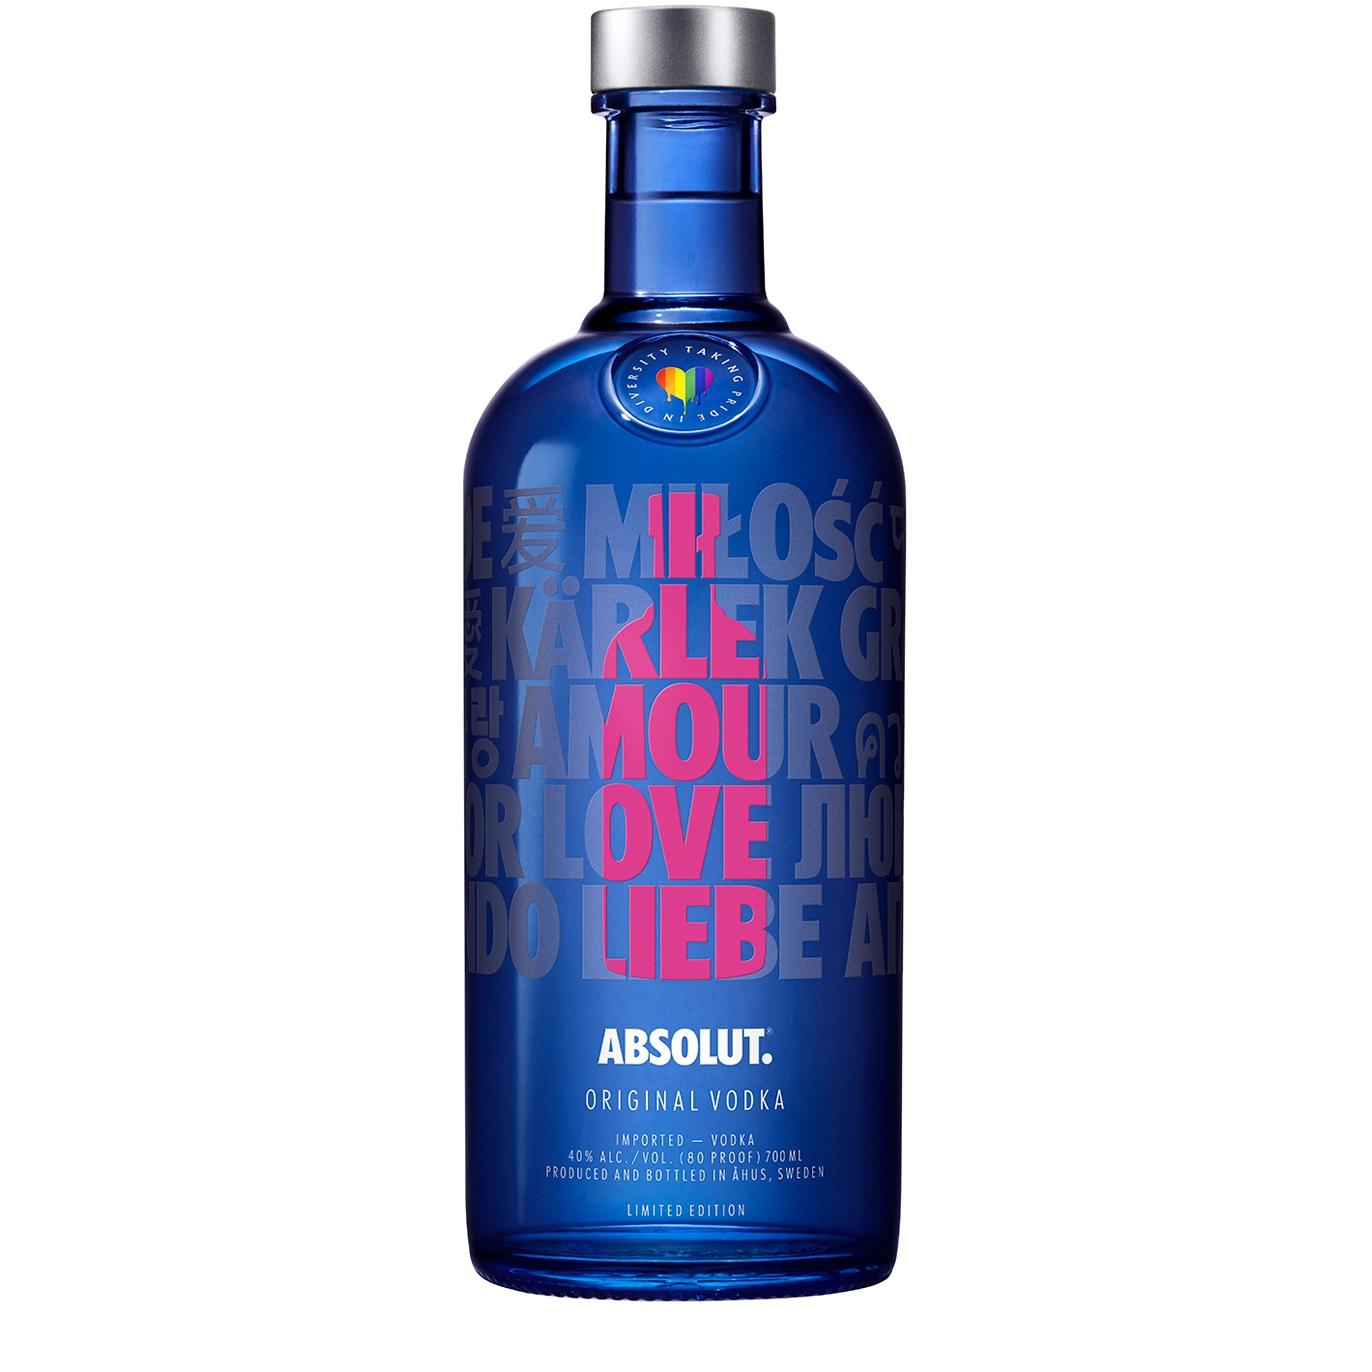 Verwonderend Absolut Absolut Drop Vodka - Pink - Harvey Nichols SM-22